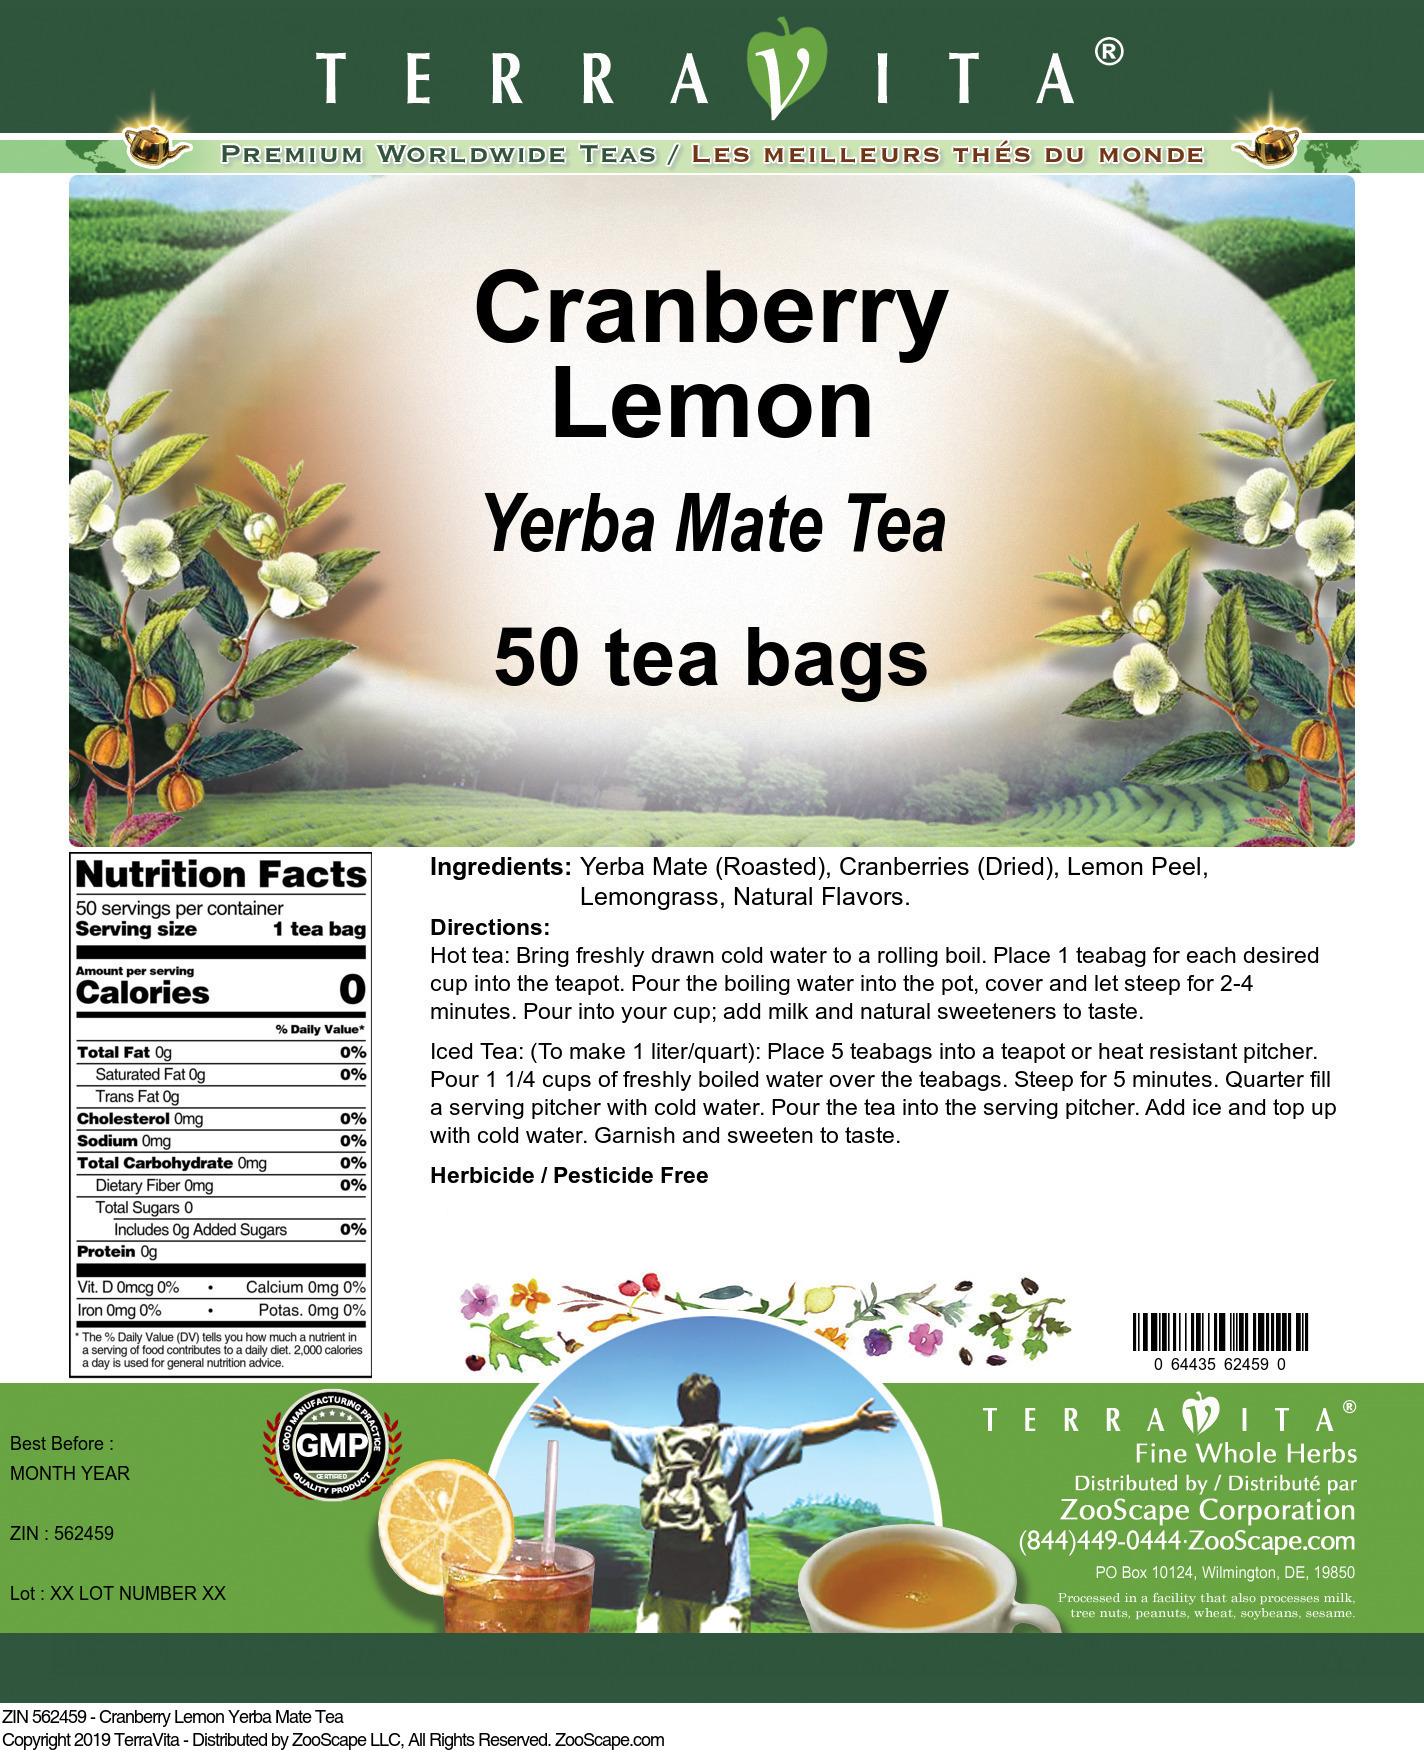 Cranberry Lemon Yerba Mate